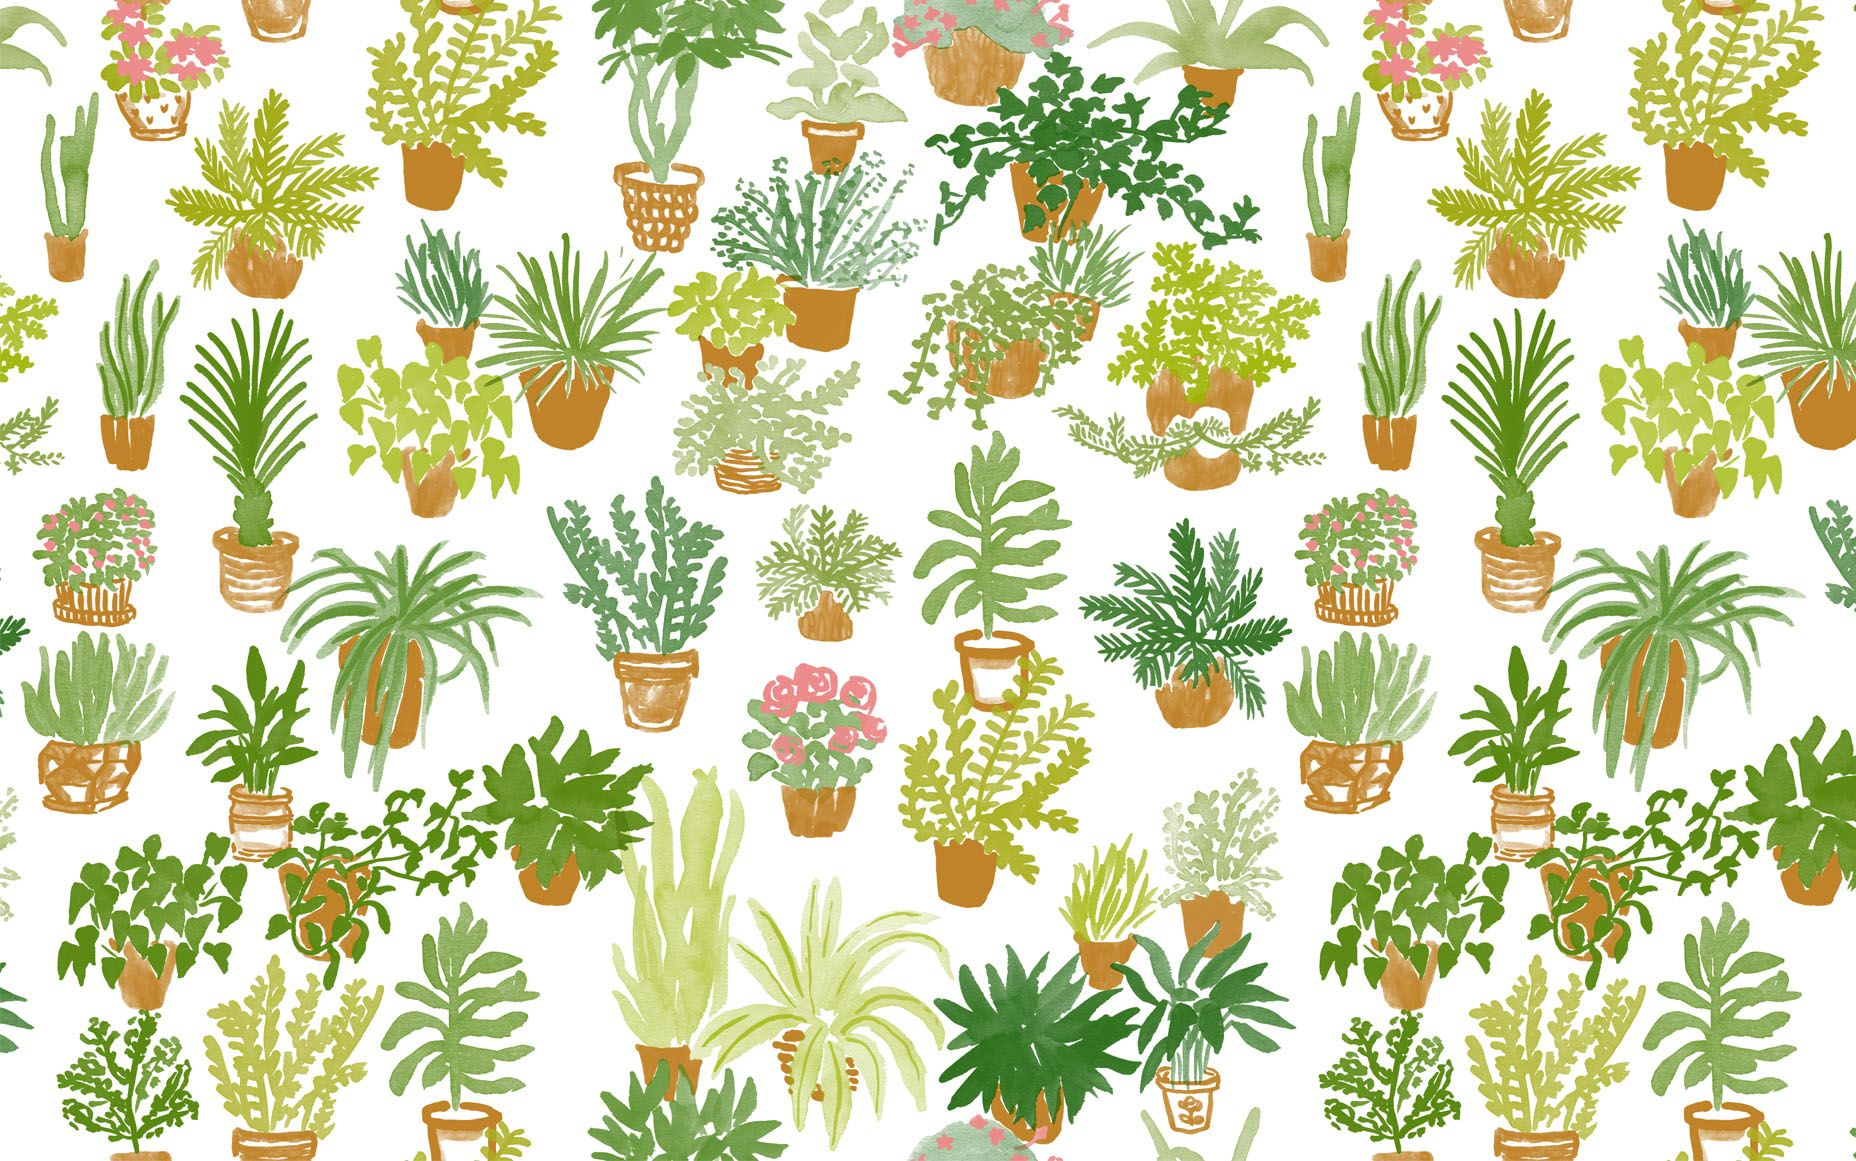 #desktop #wallpaper #plants | Art: Desktop Wallpaper in ...